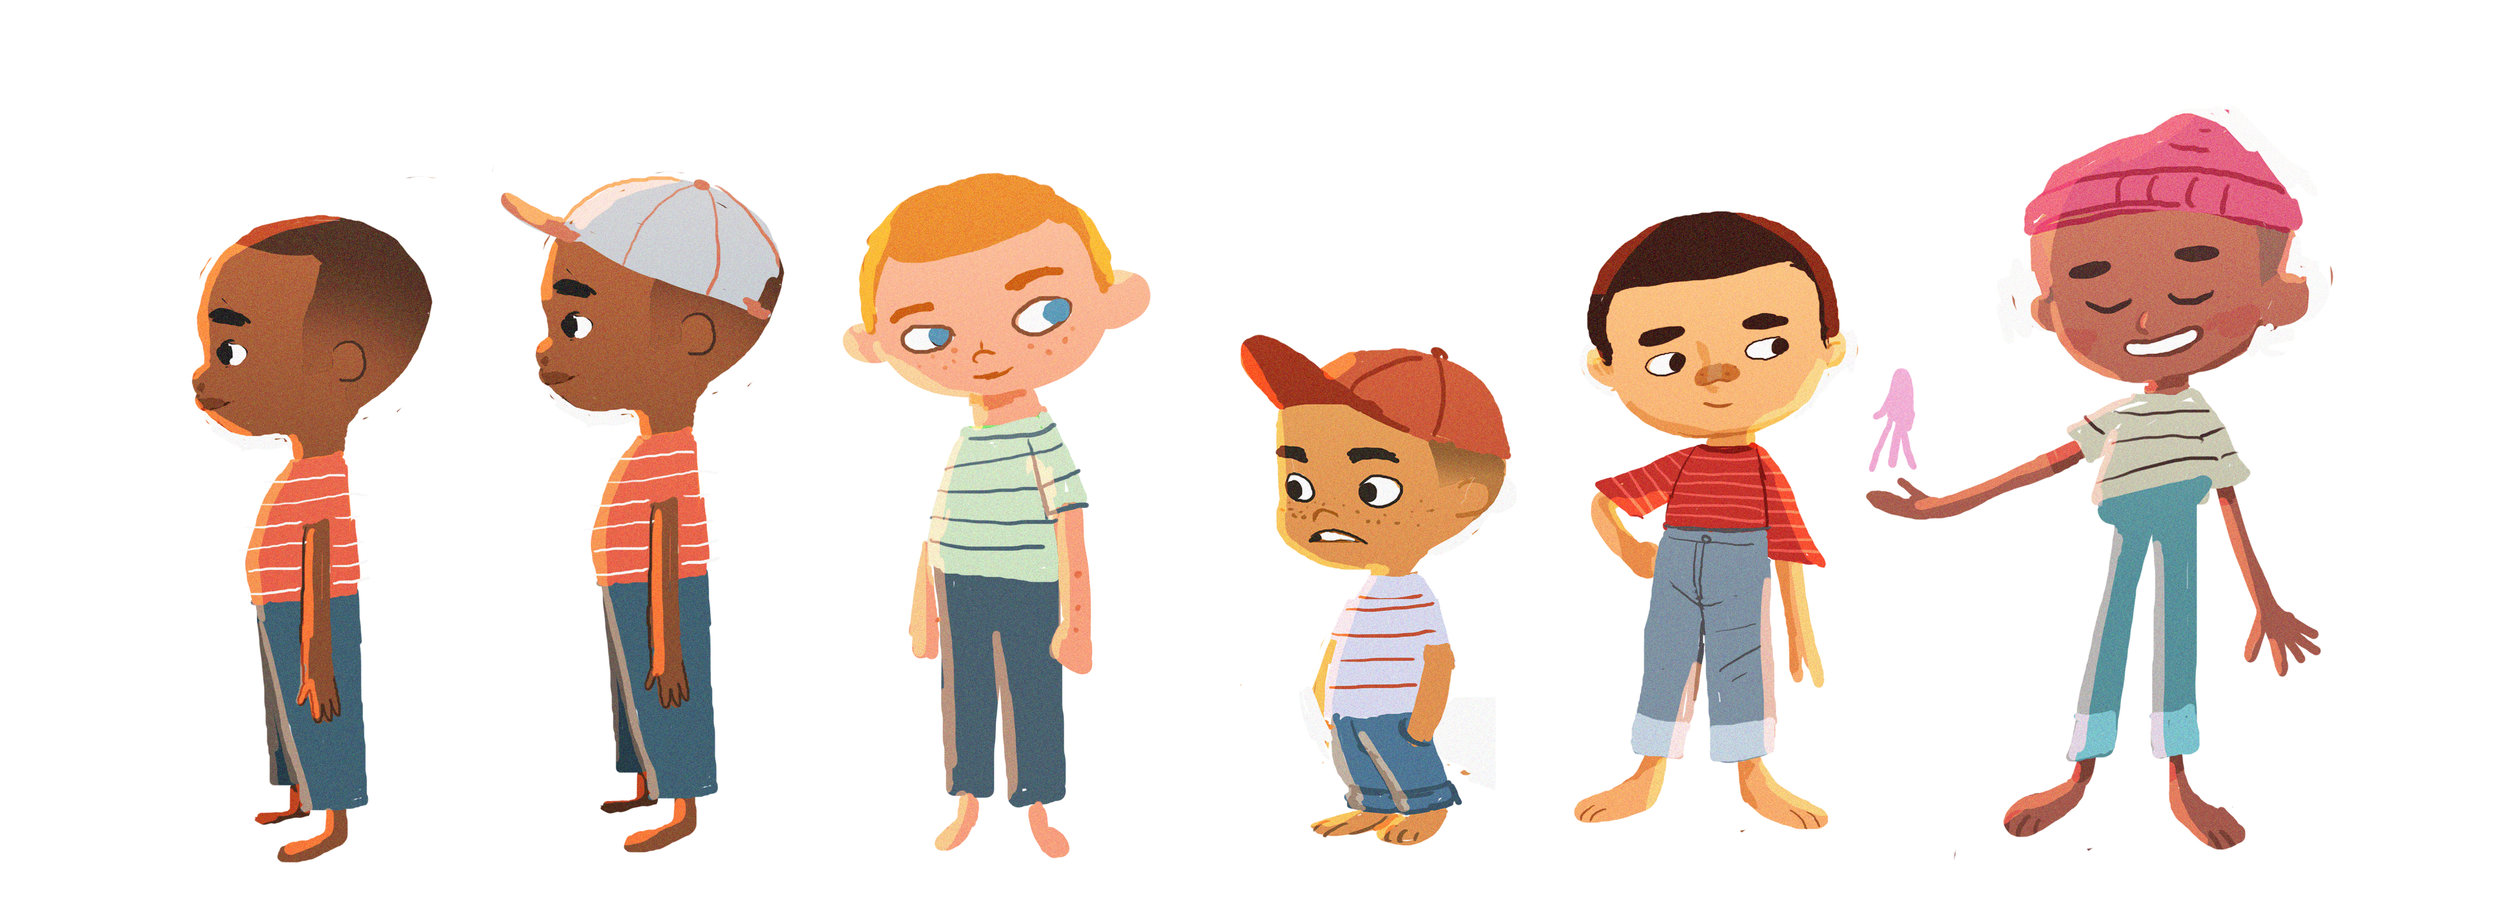 boy exploration (1).jpg